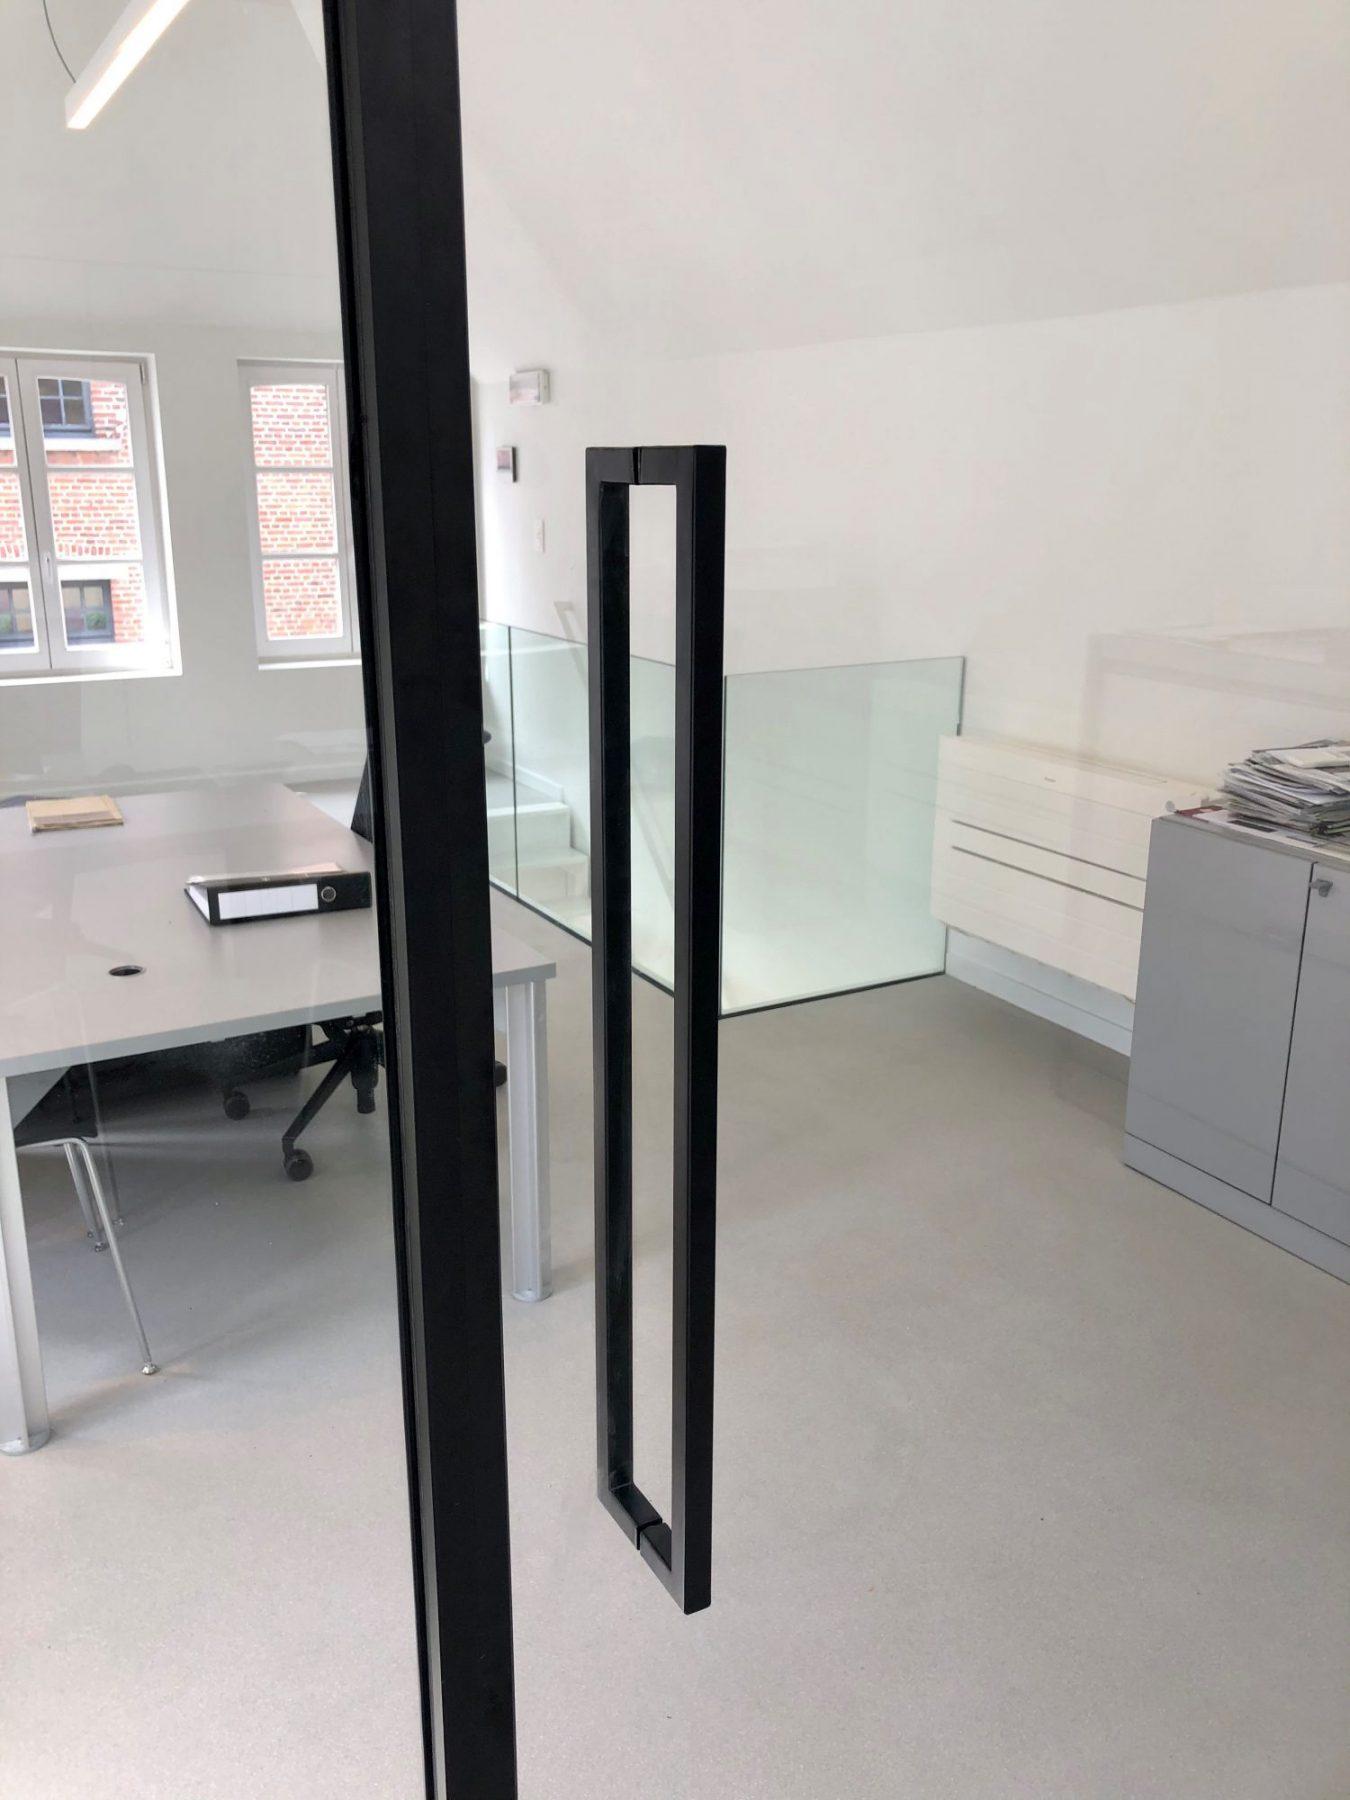 https://allglas.be/wp-content/uploads/2021/06/all-glas-walschaerts-bonheiden-interieurglas-steellook-glaswand-immovos-04-scaled.jpg